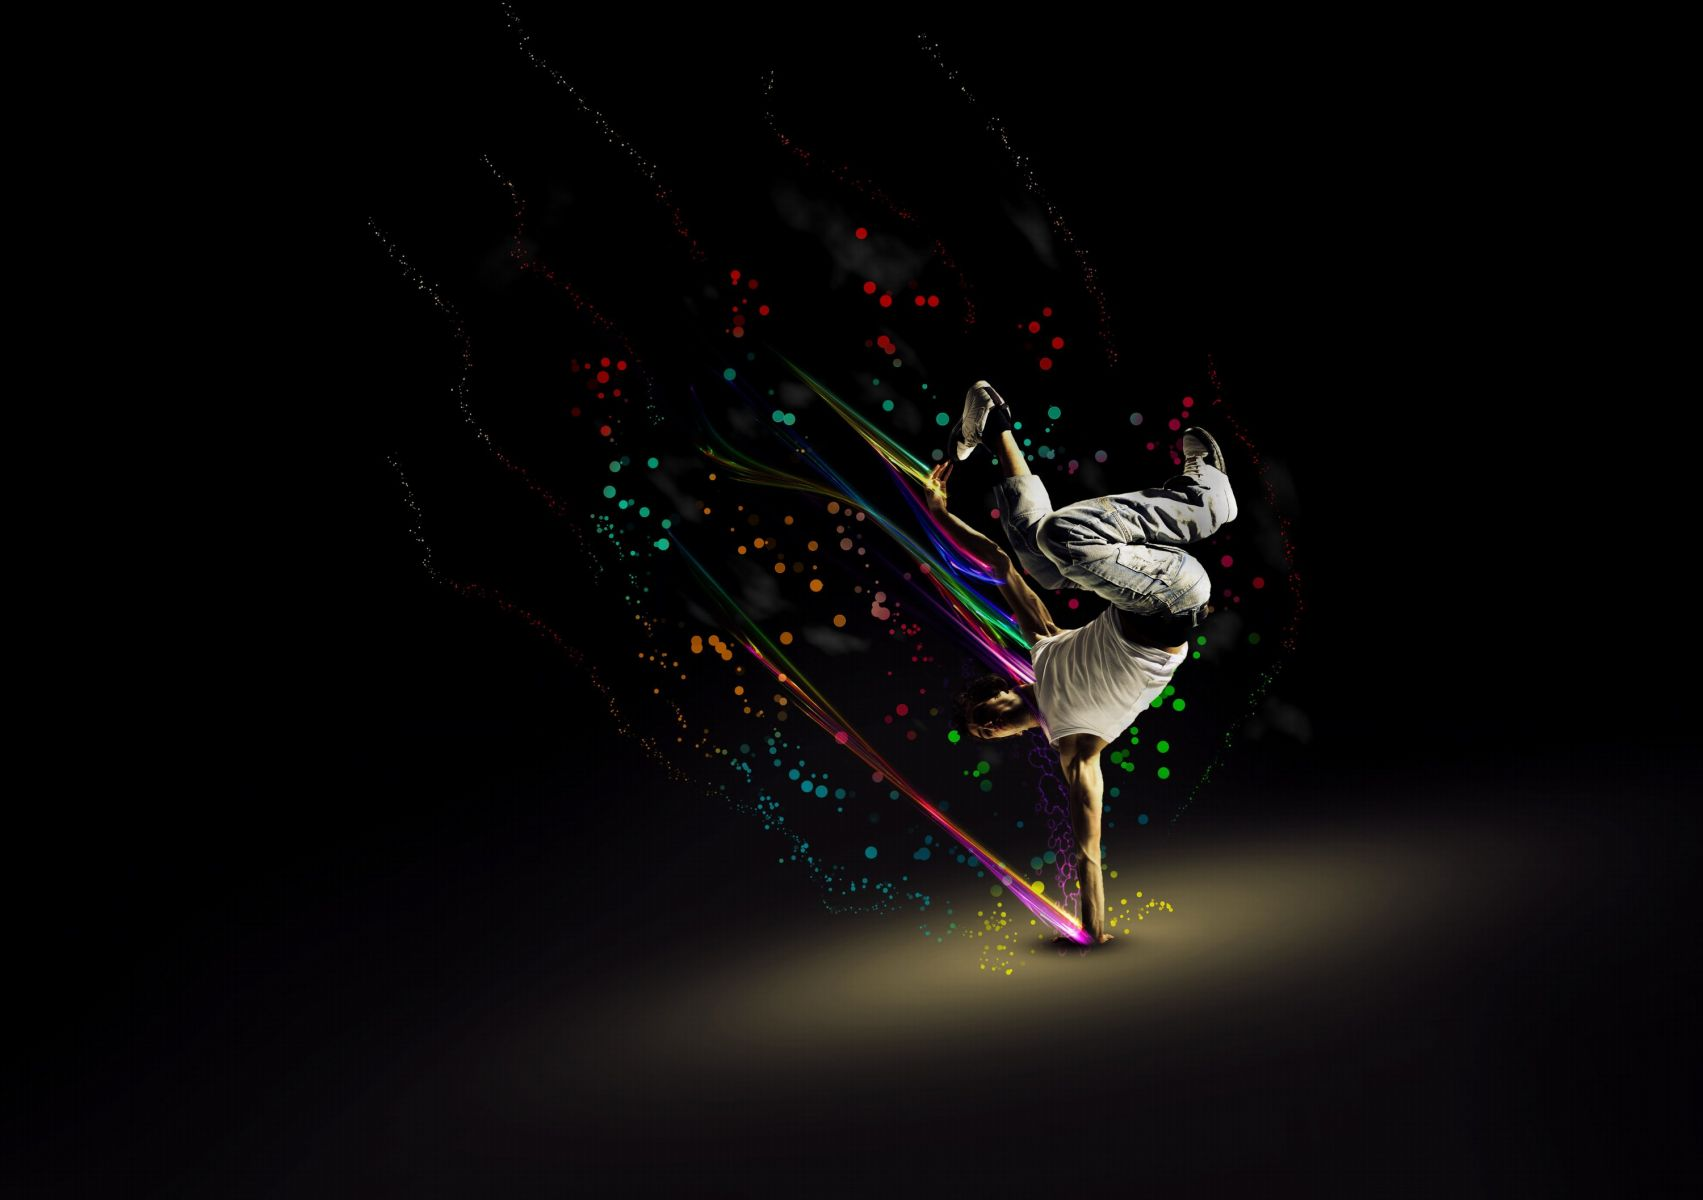 28 Dance Music Wallpapers On Wallpapersafari